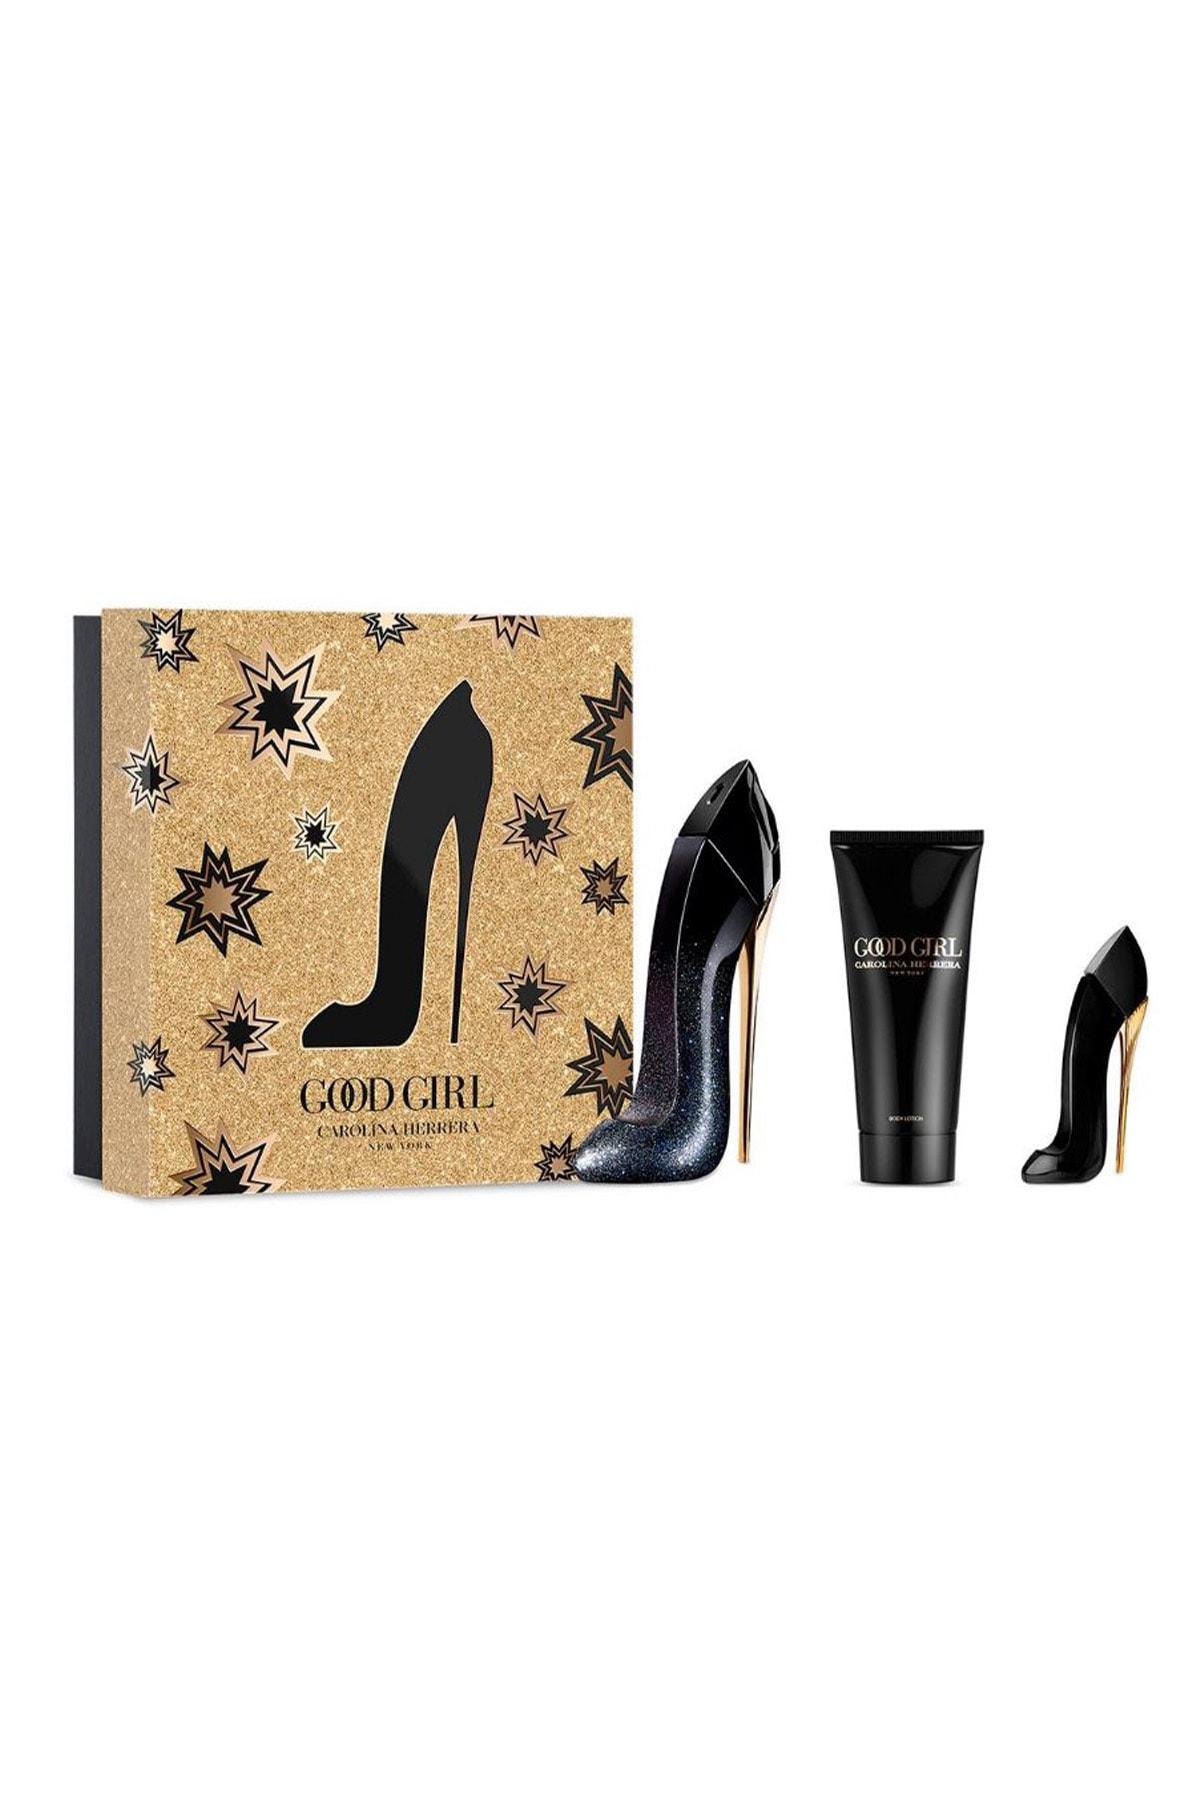 Carolina Herrera Good Girl Supreme Edp 80 ml + Body Lotion 100 ml + Miniatüre 8411061988770 1